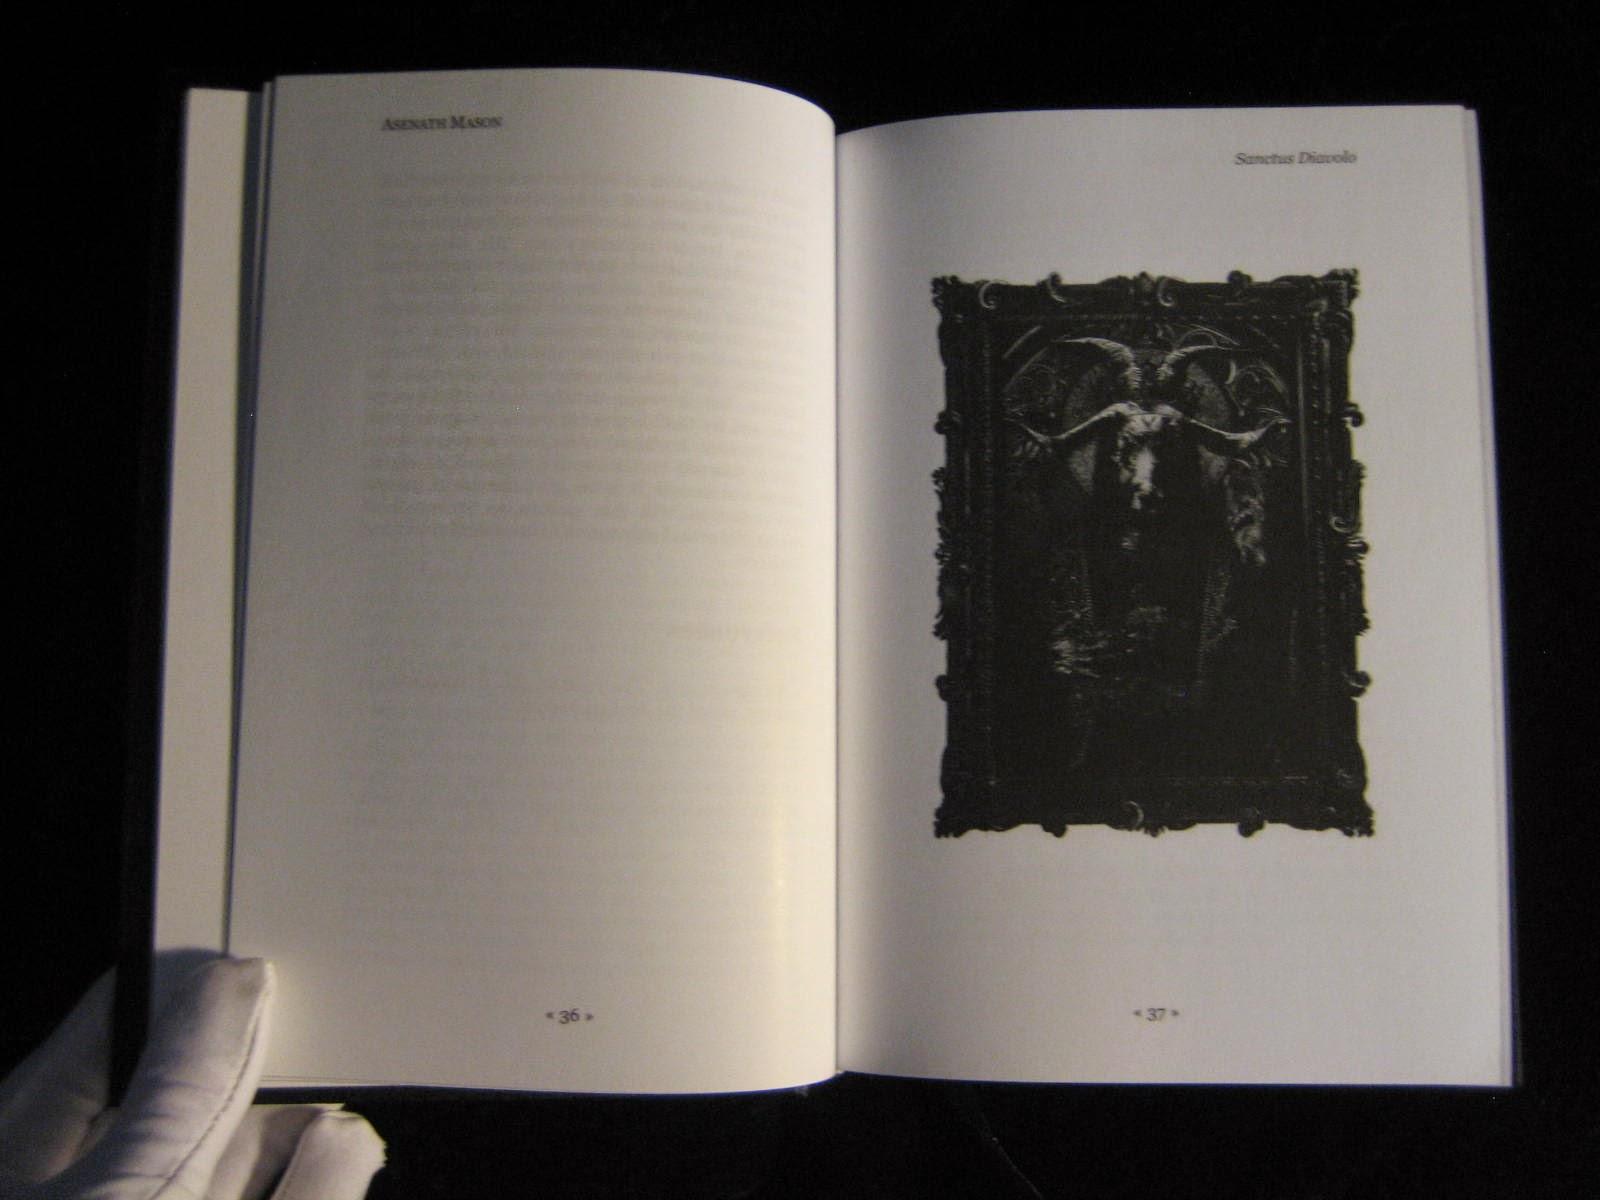 Ea Koetting Works Of Darkness Pdf Converter - centerxilus